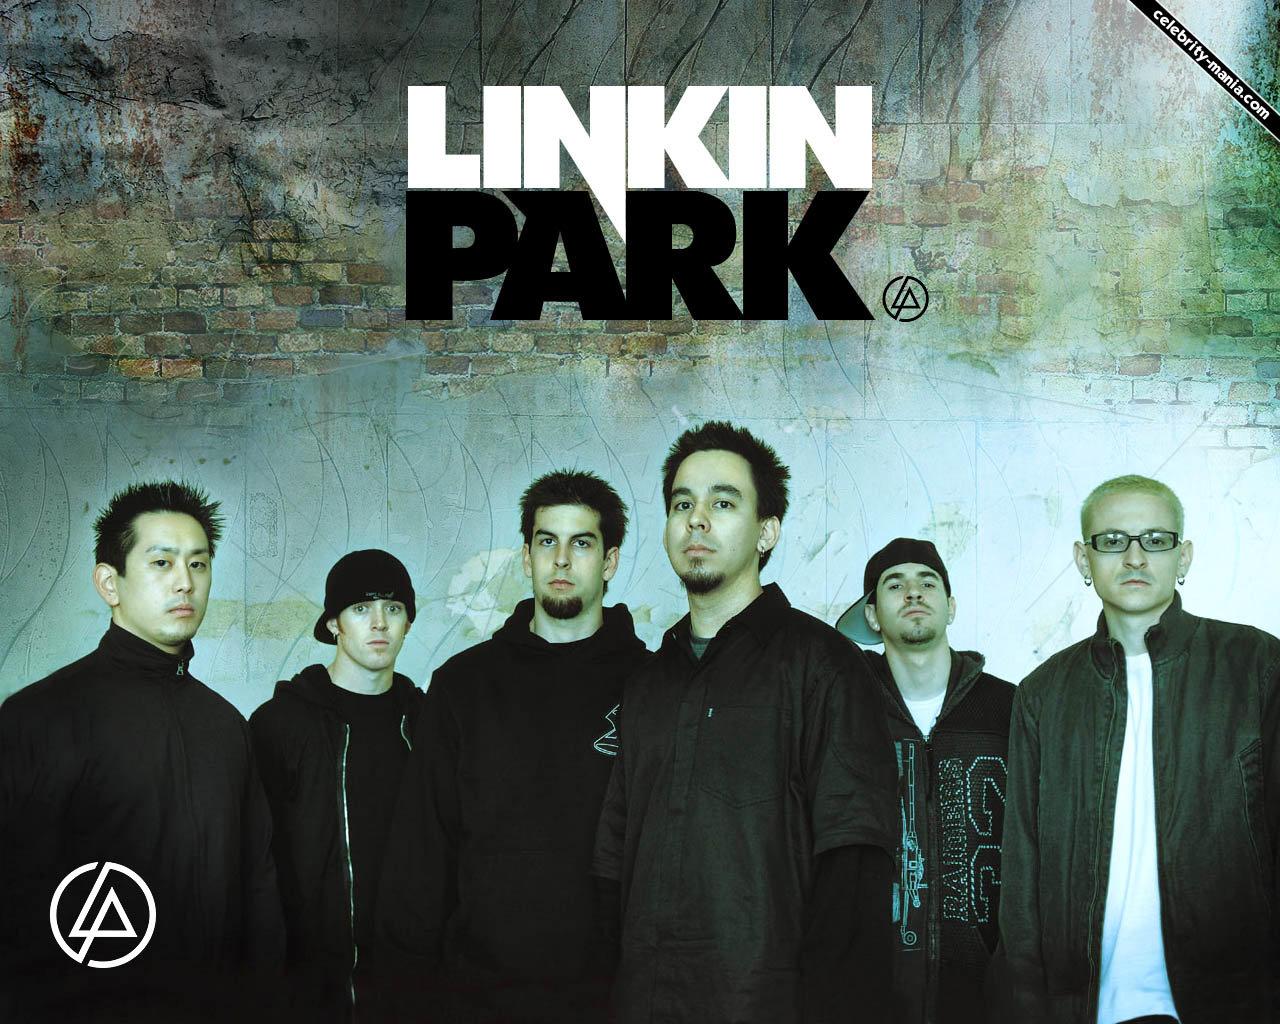 High Resolution Linkin Park Hd 1280x1024 Background Id 69154